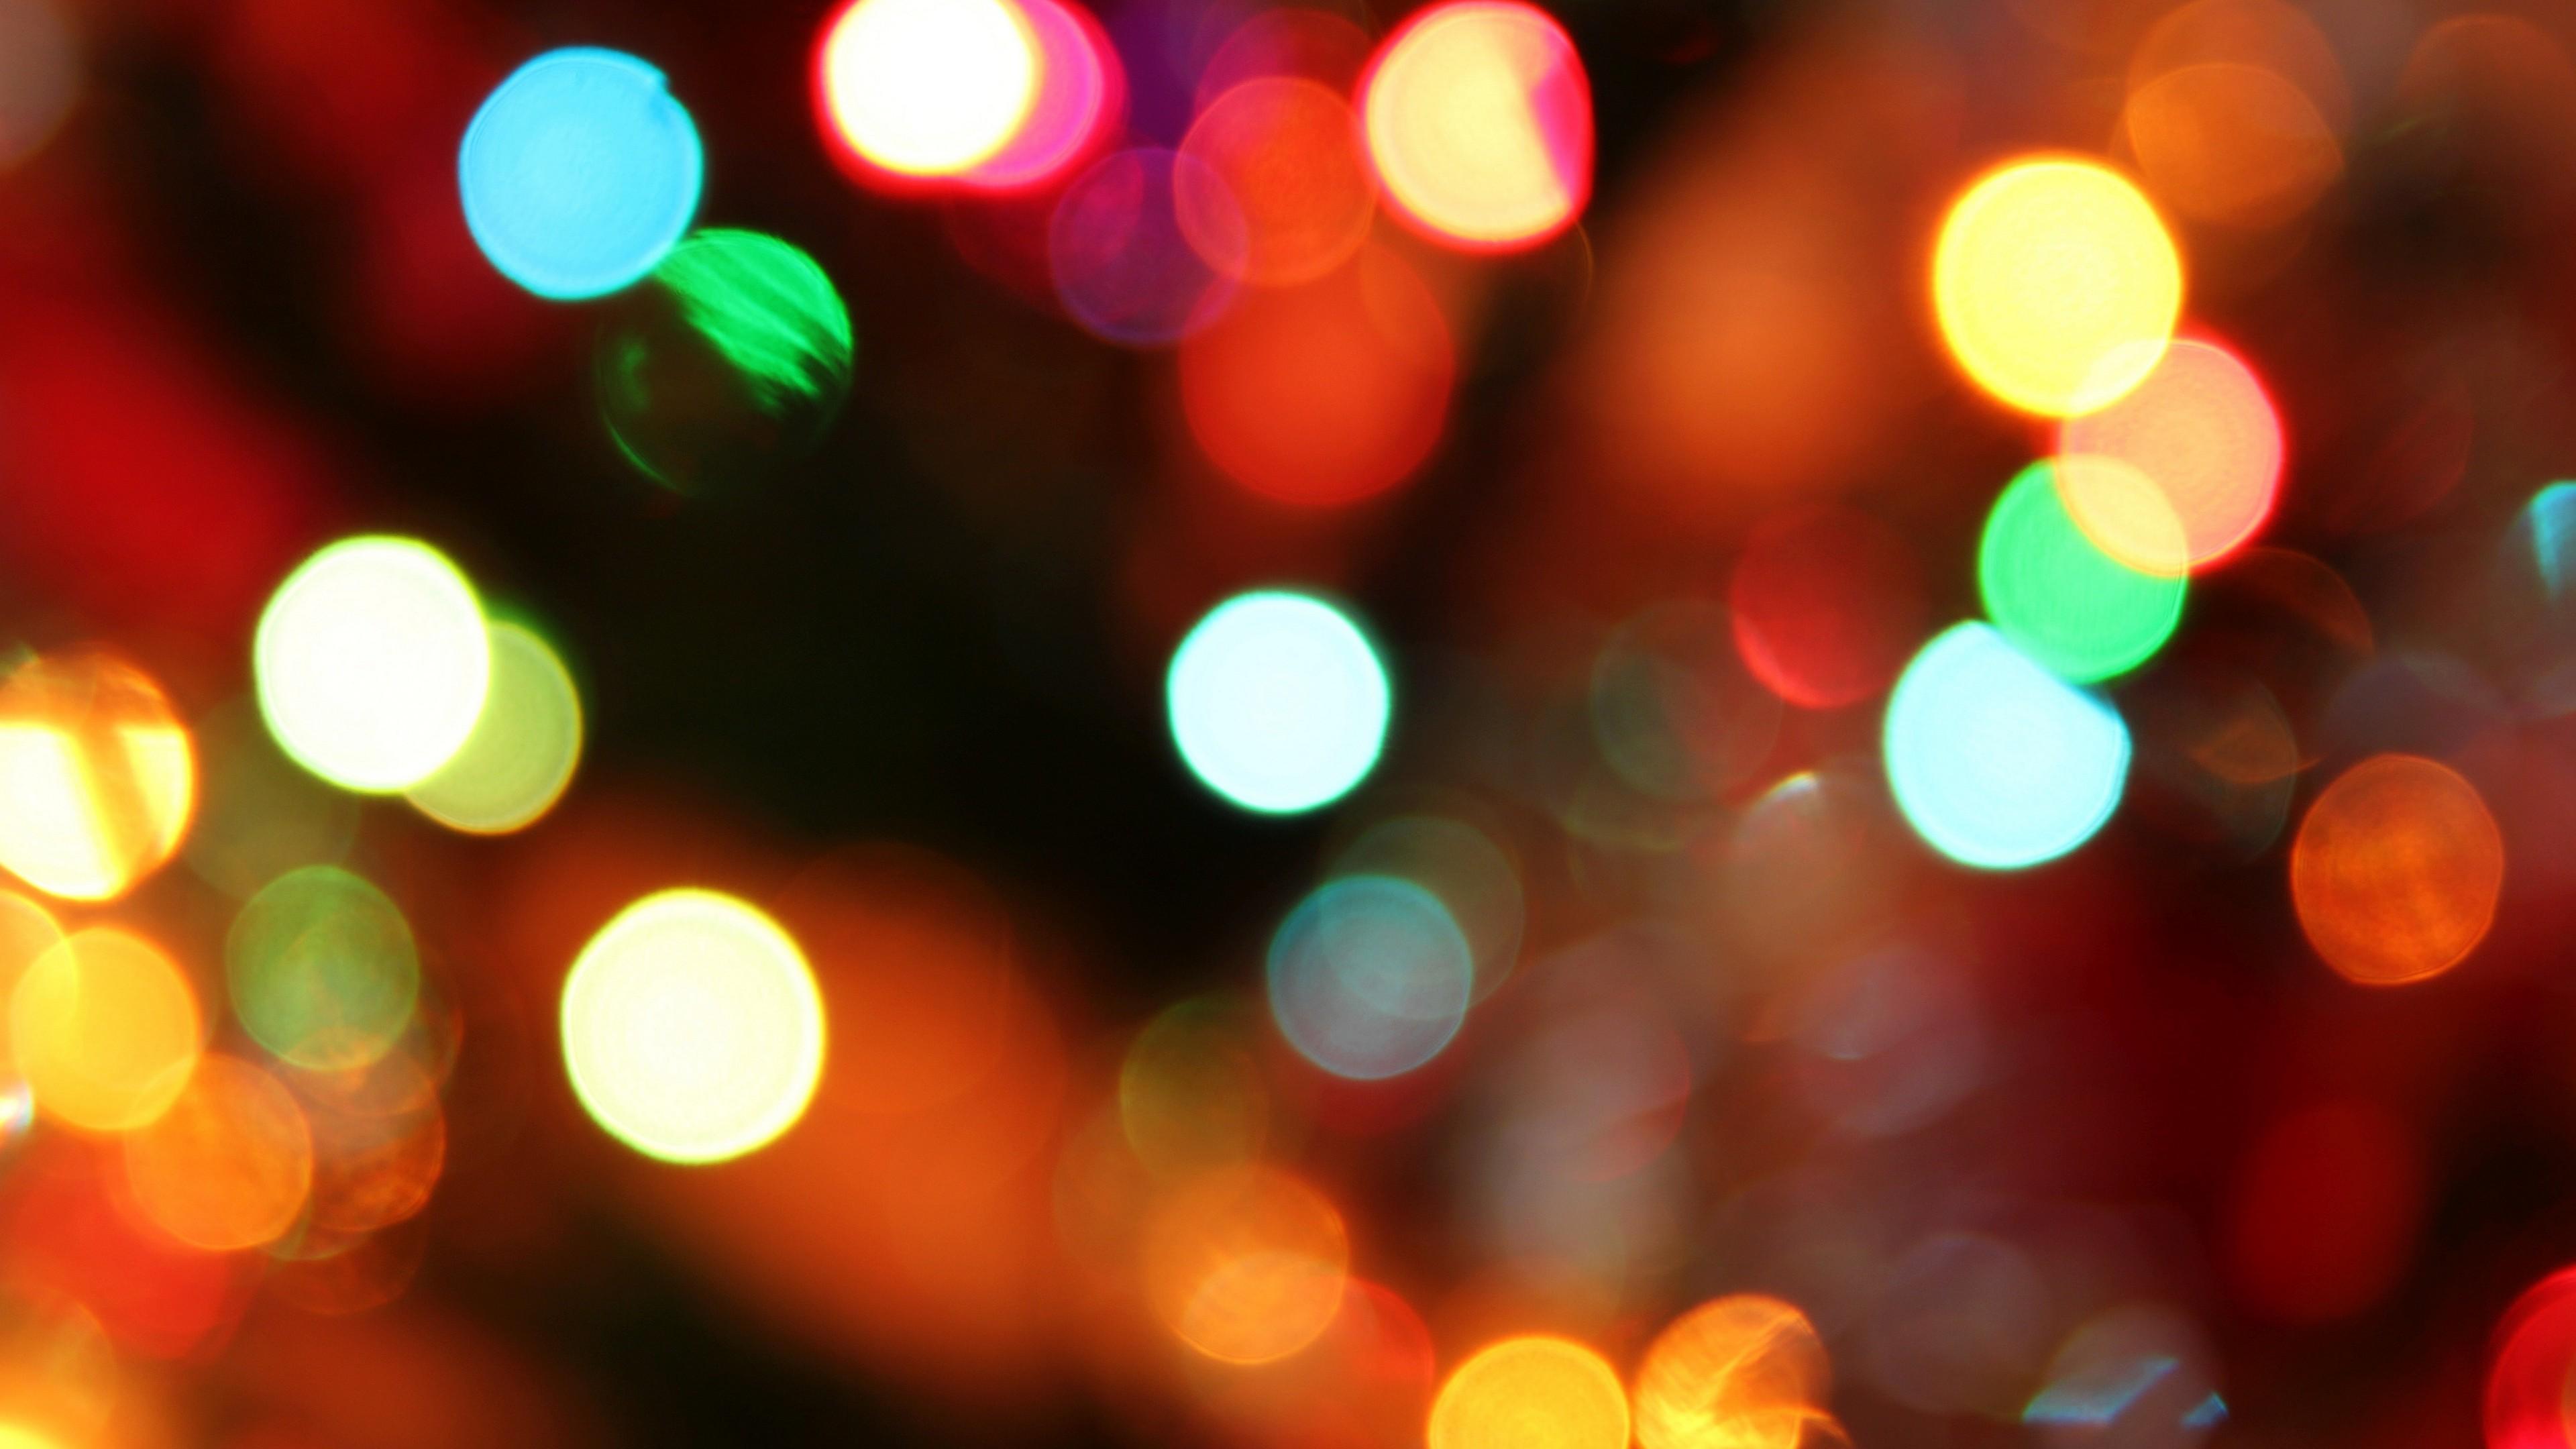 Christmas Lights Bokeh Wallpaper - Christmas - Free Desktop Backgrounds